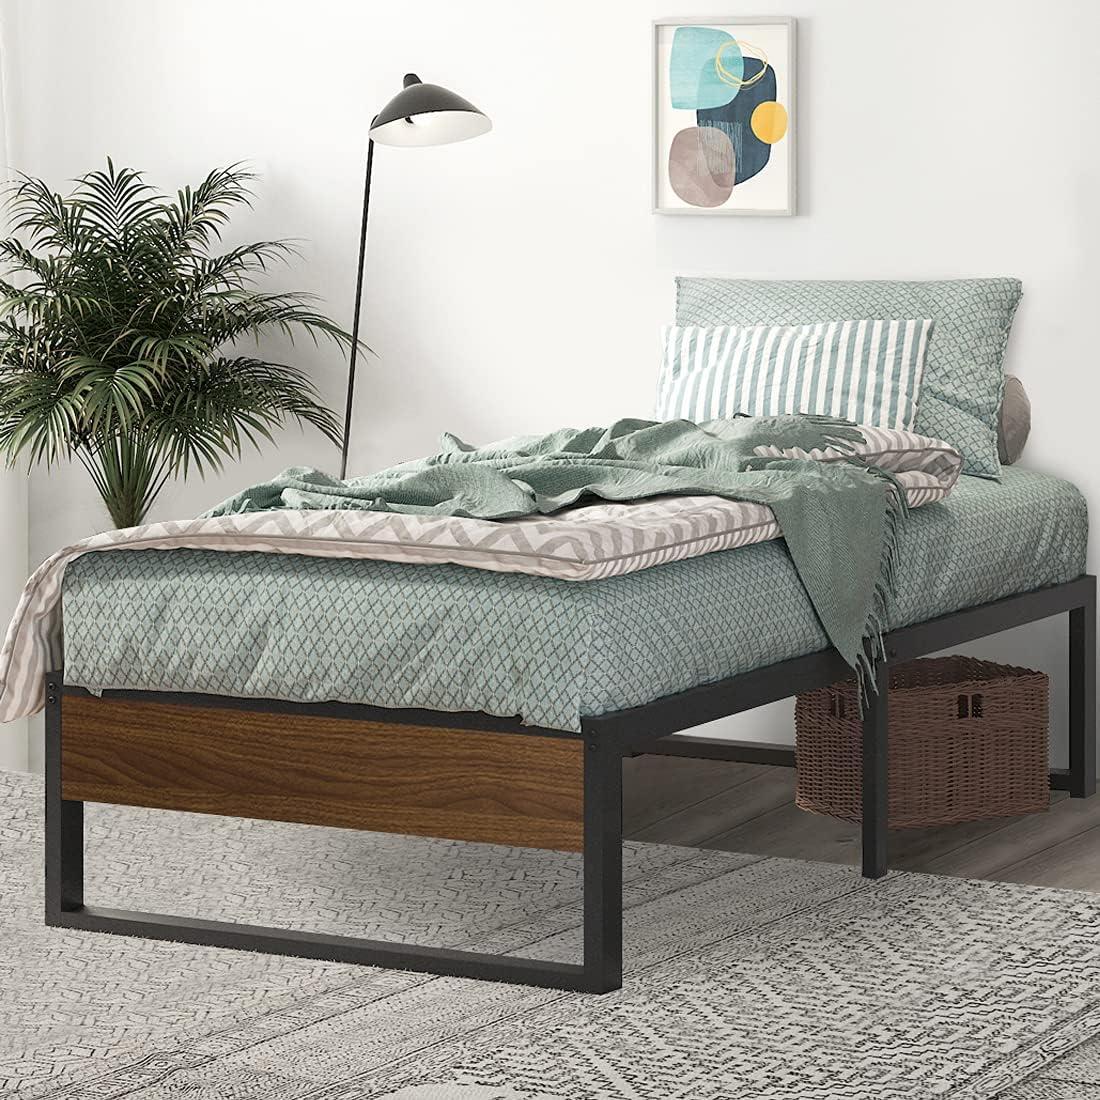 SHA CERLIN Twin Size Platform 14 Bed Metal Frame Popular product Cheap bargain Inch